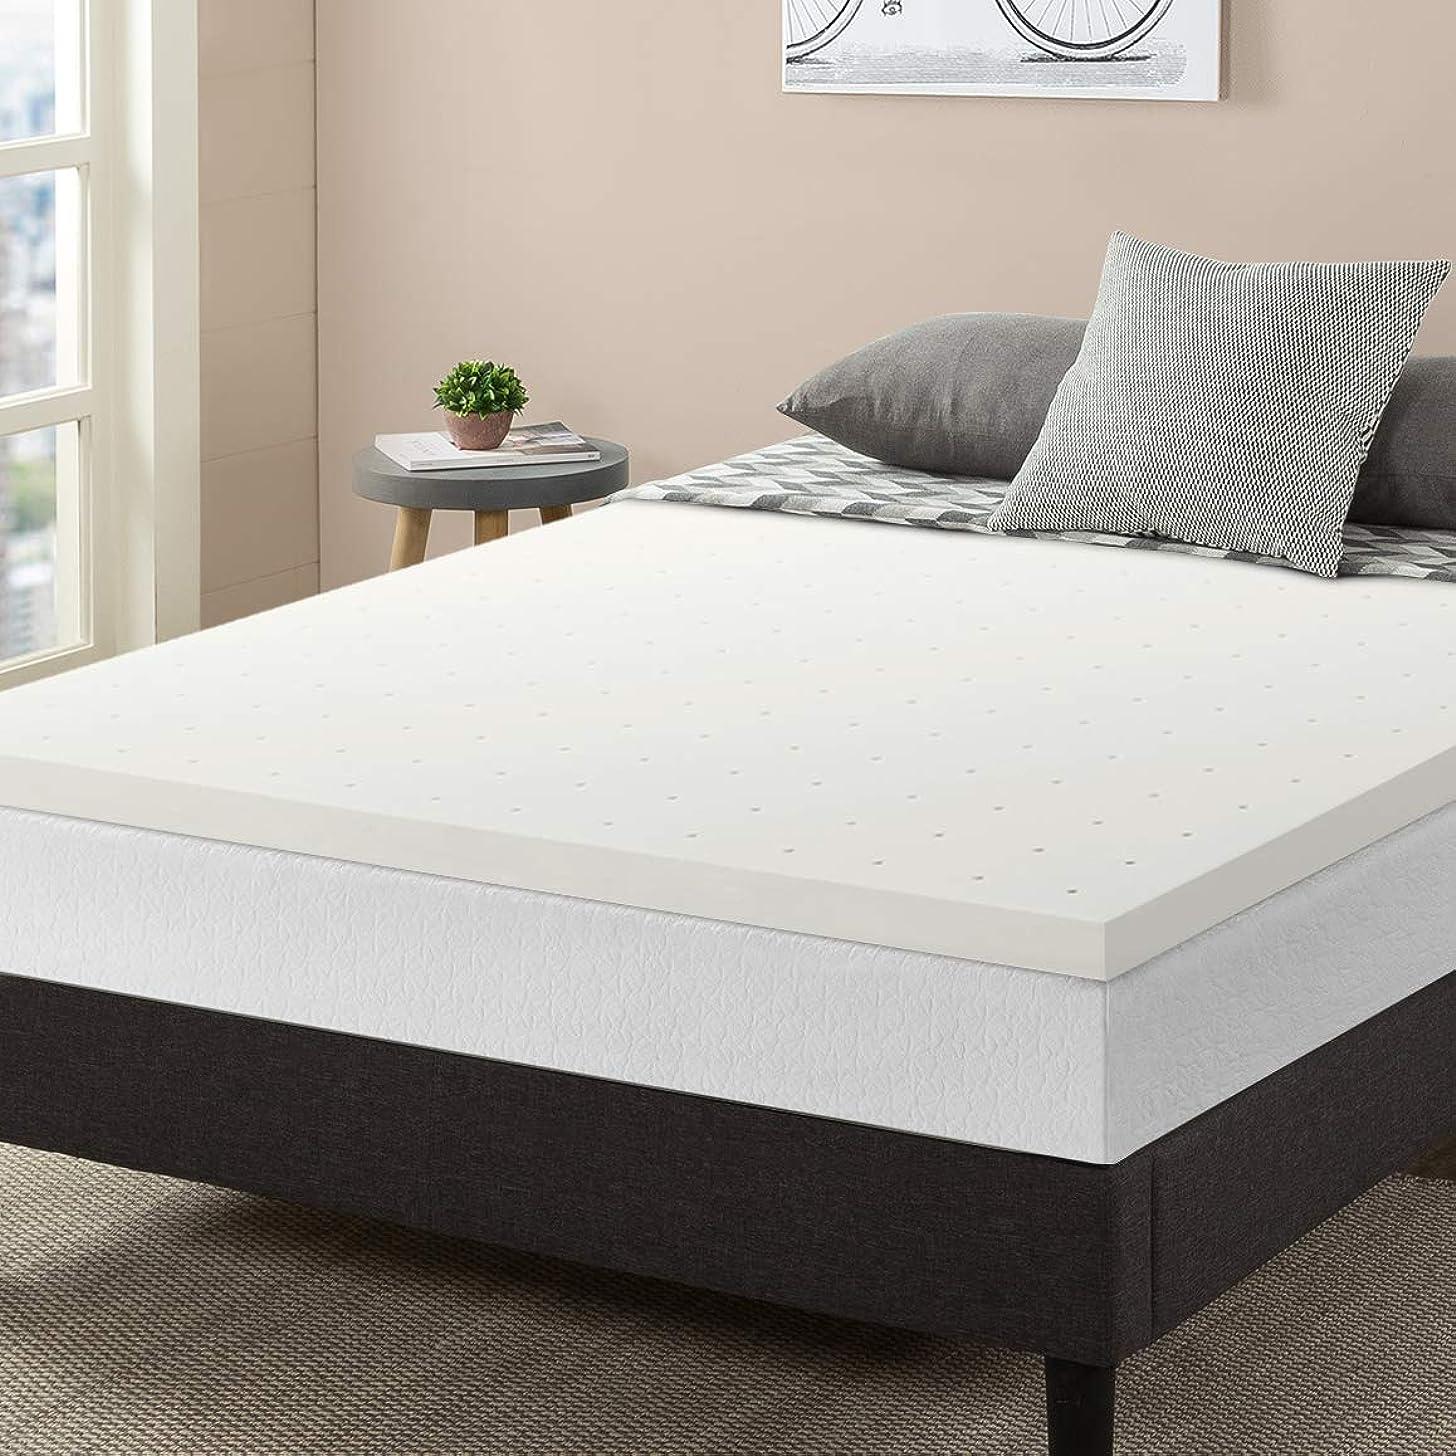 Best Price Mattress, 2.5 Inch Ventilated Memory Foam Mattress Topper, Certipur-US Certified, Twin Extra Long Size